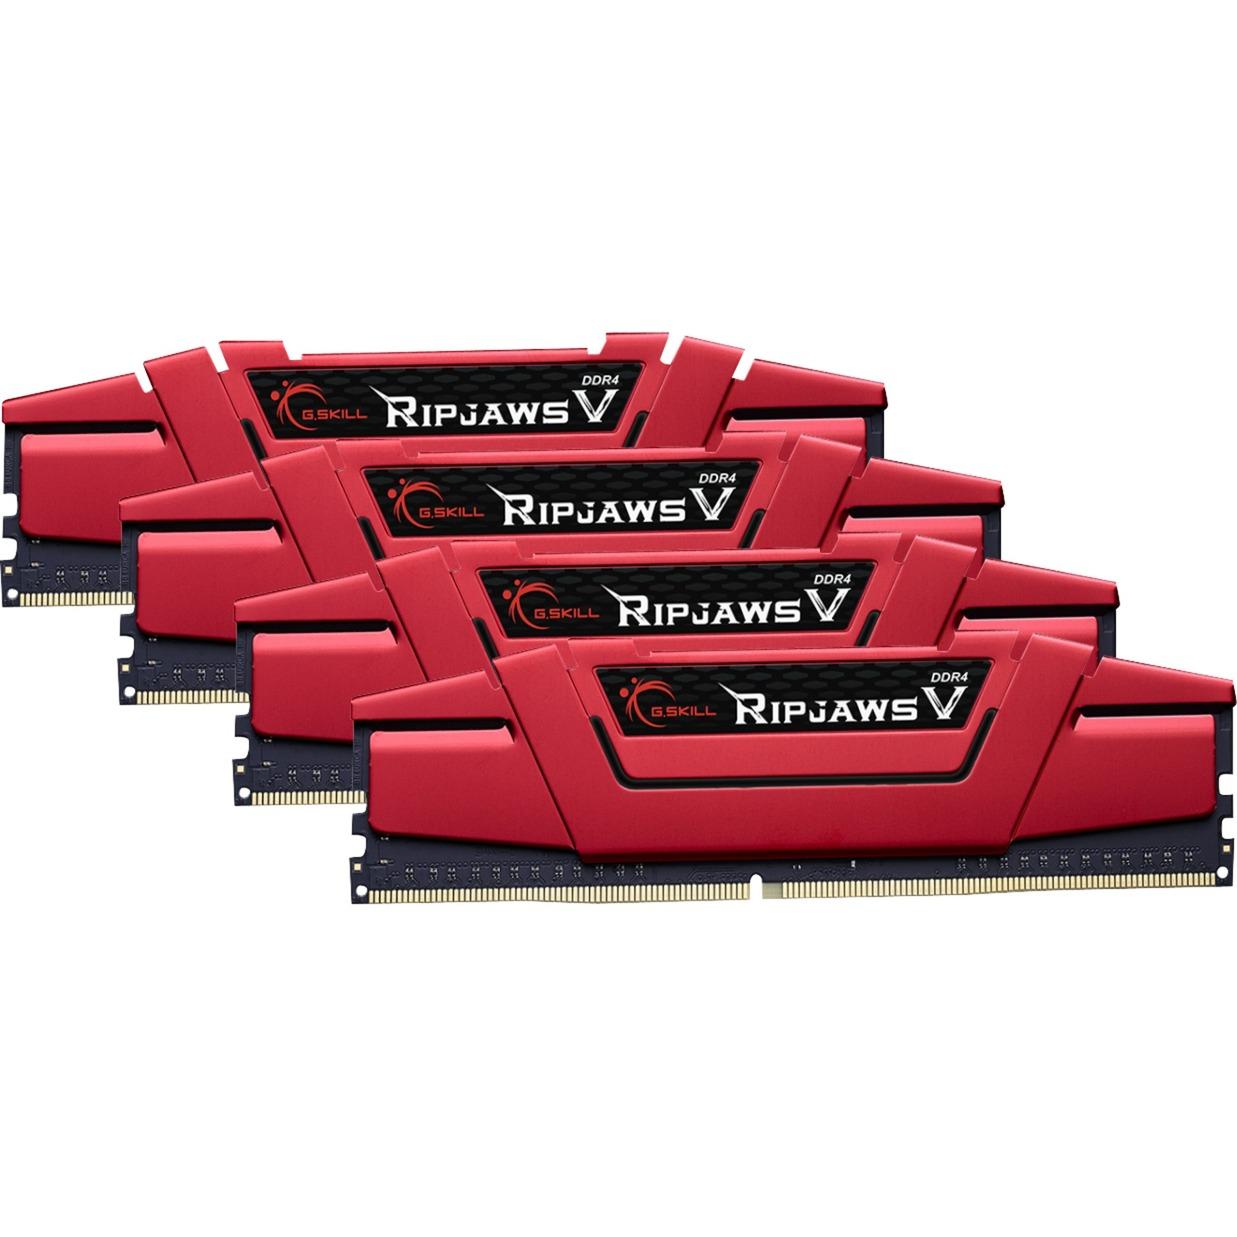 D432Go 3000-14 Ripjaws V Red K4 GSK, Mémoire